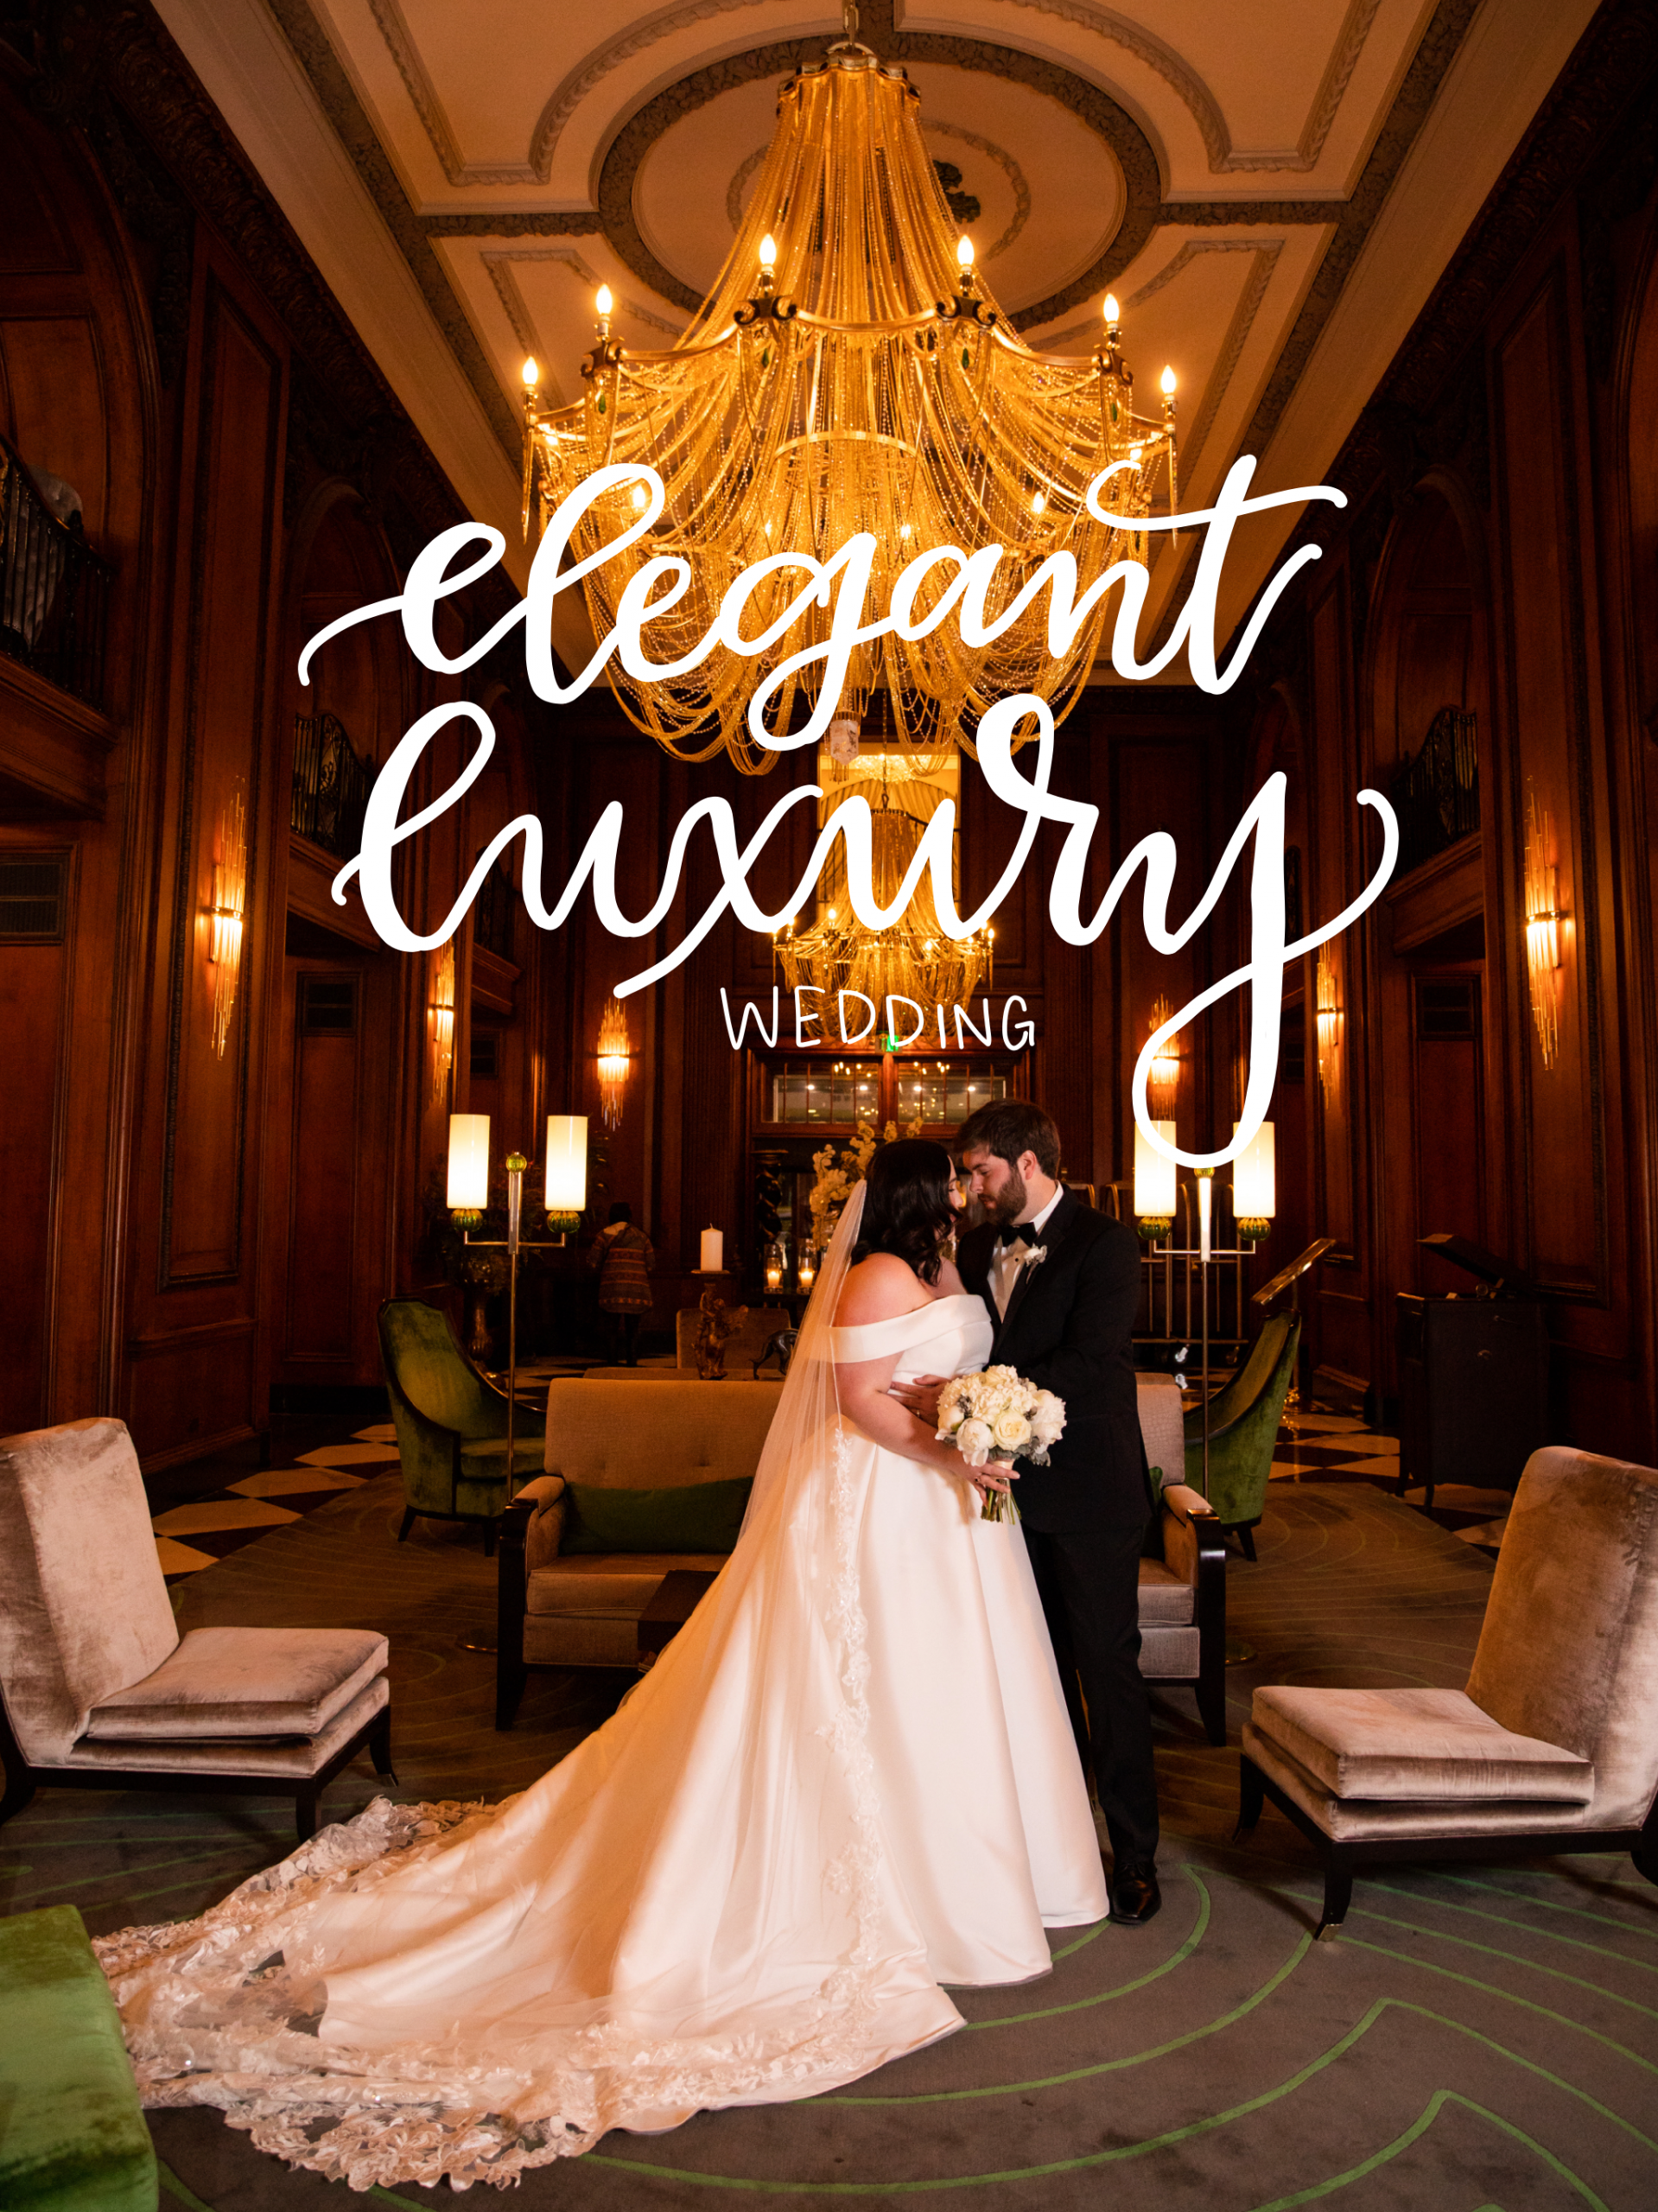 Bride and Groom in luxury wedding venue